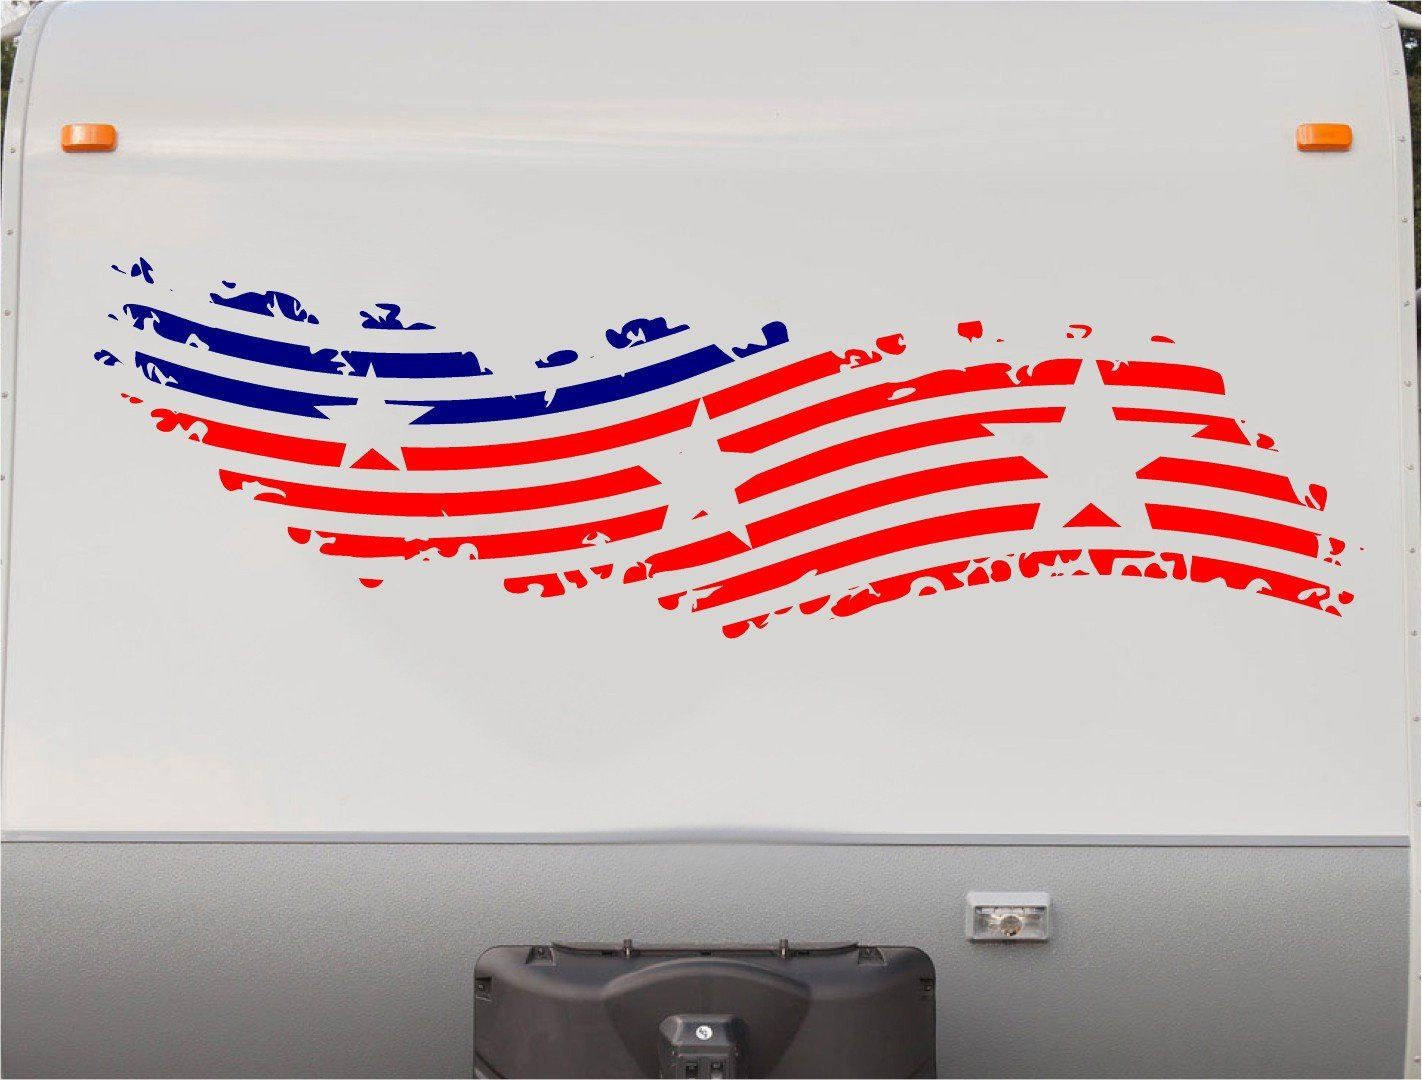 Usa flag stars and stripes rv camper 5th wheel motorhome vinyl decal sticker graphic custom text mural us014